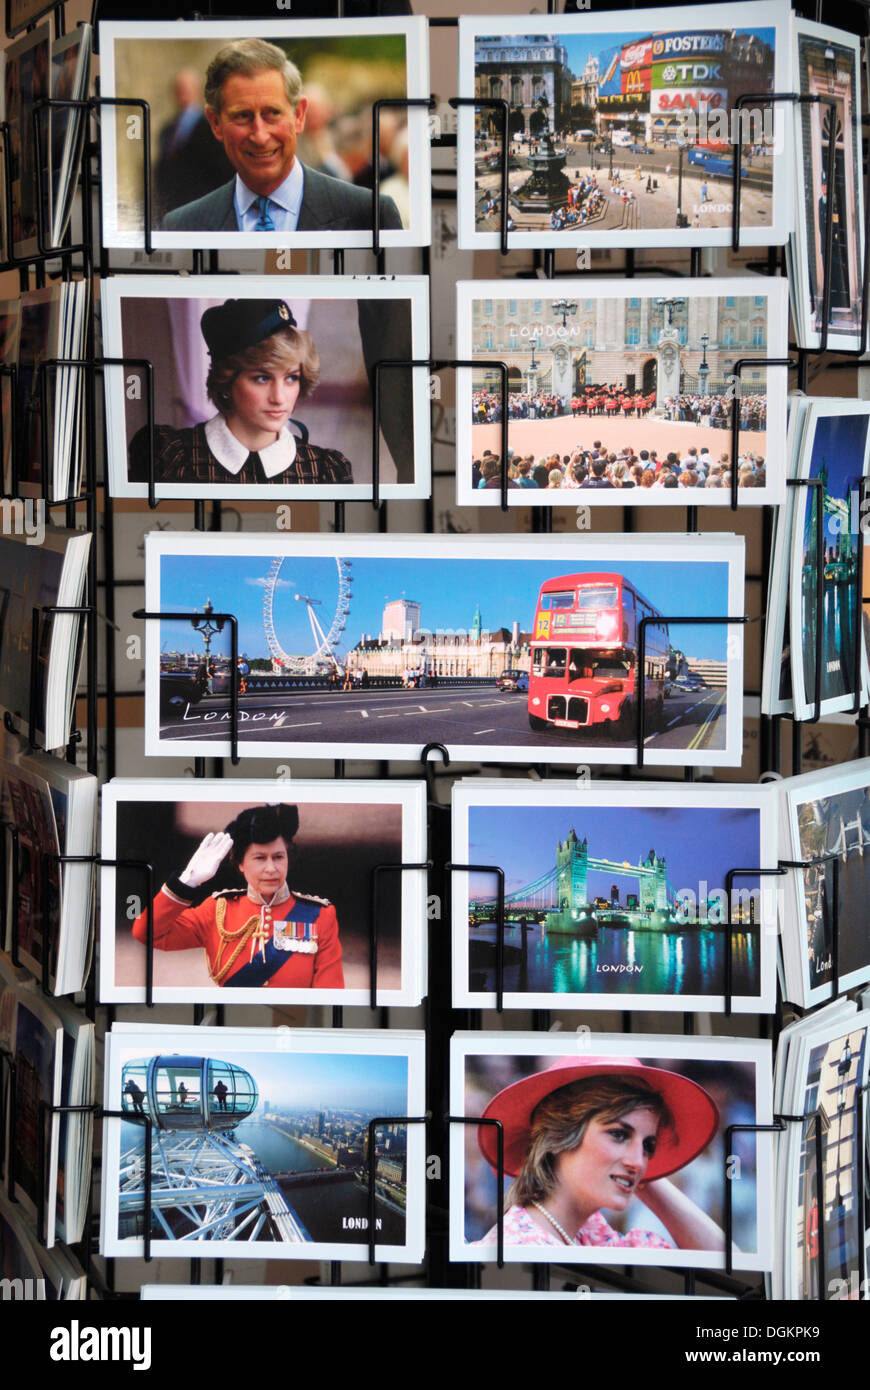 London postcards. - Stock Image